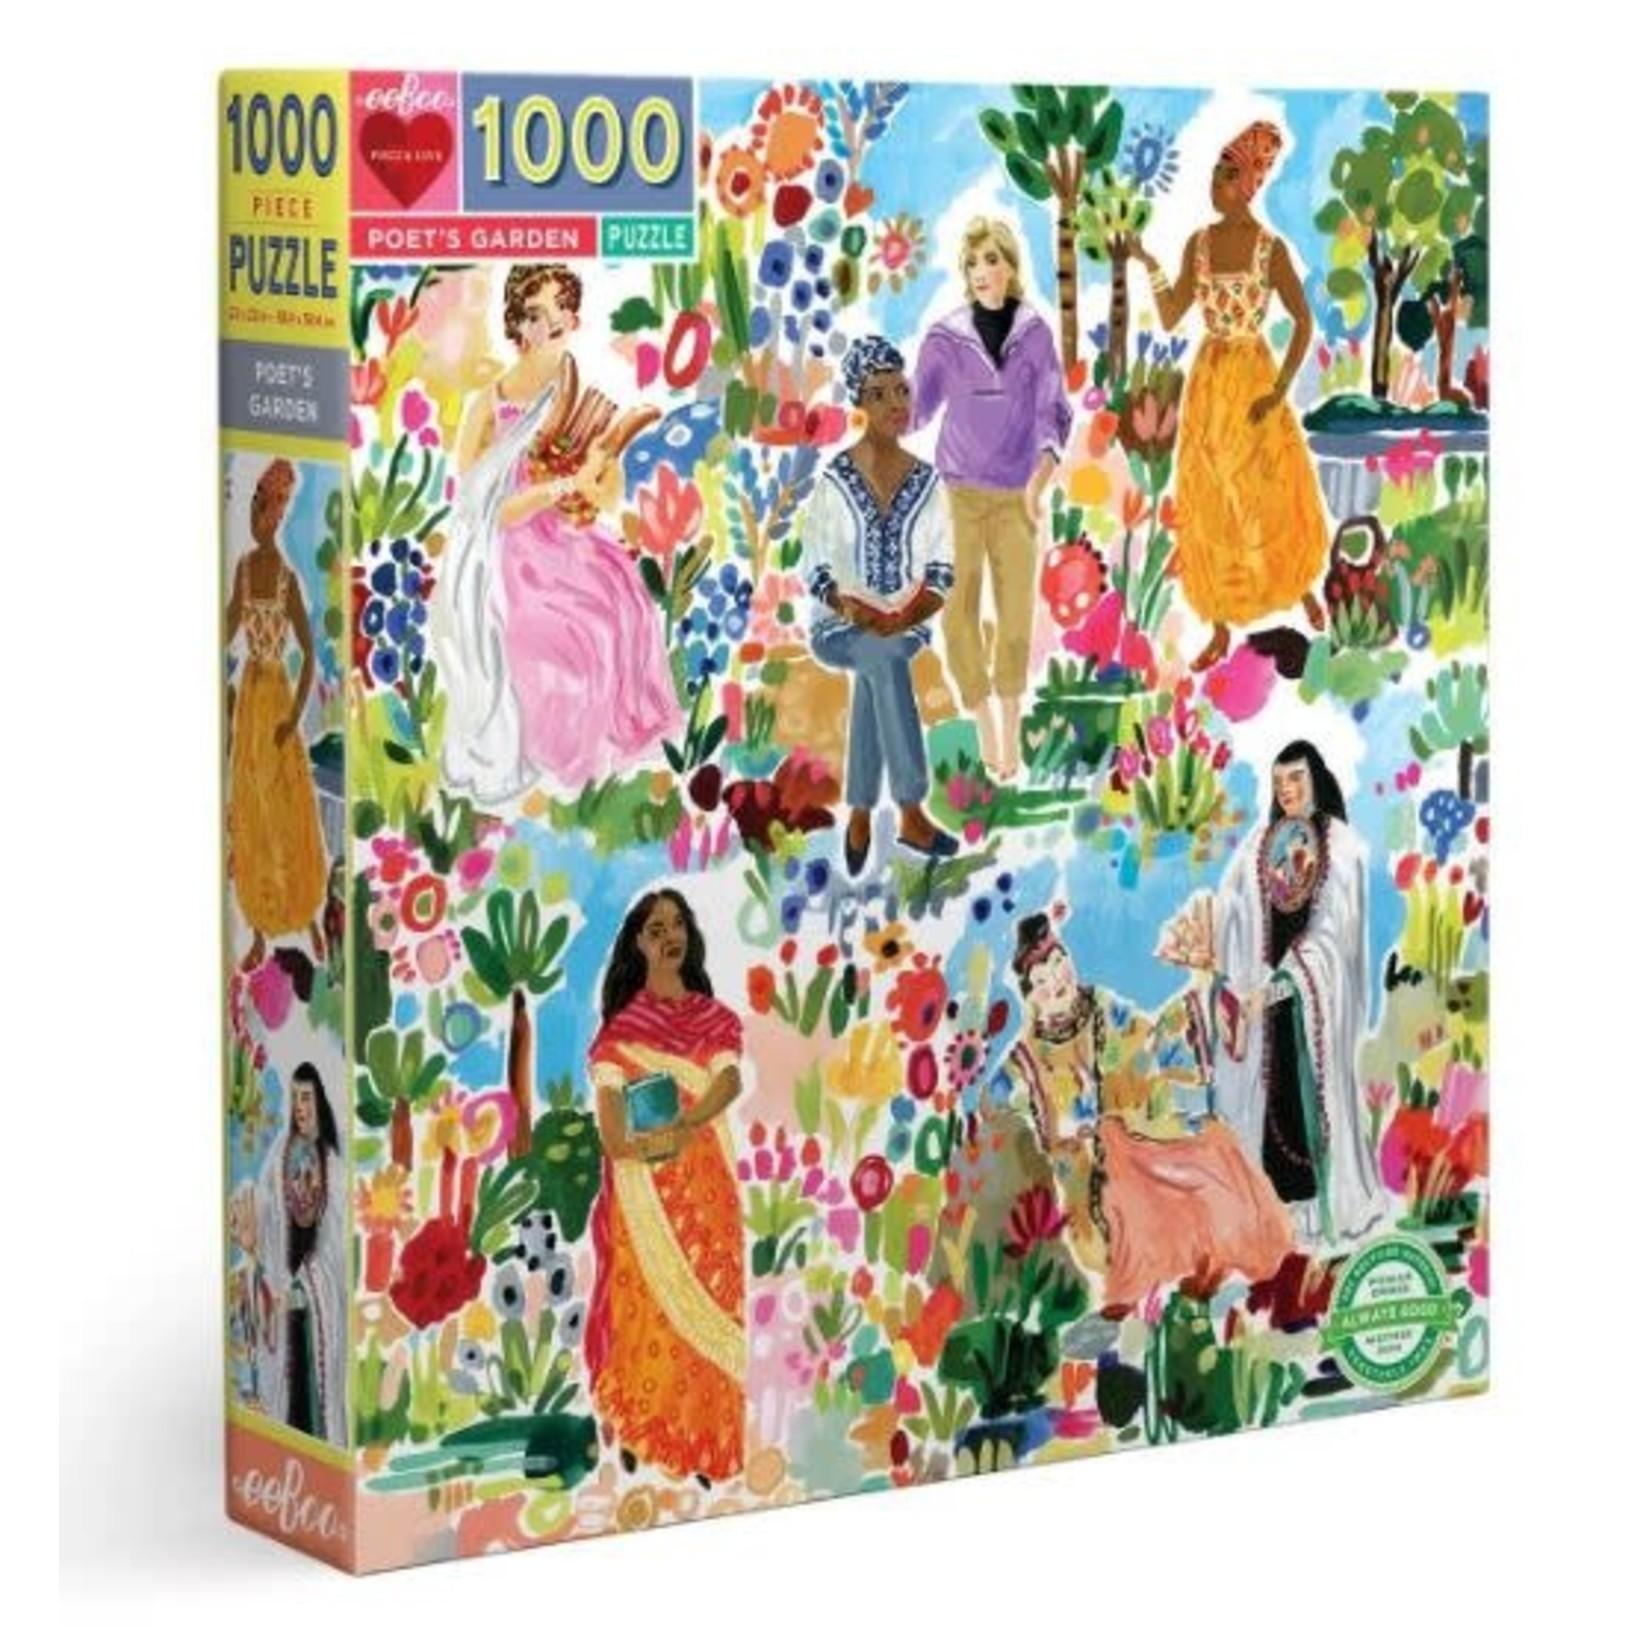 Eeboo Poet's Garden - 1000 Piece Jigsaw Puzzle